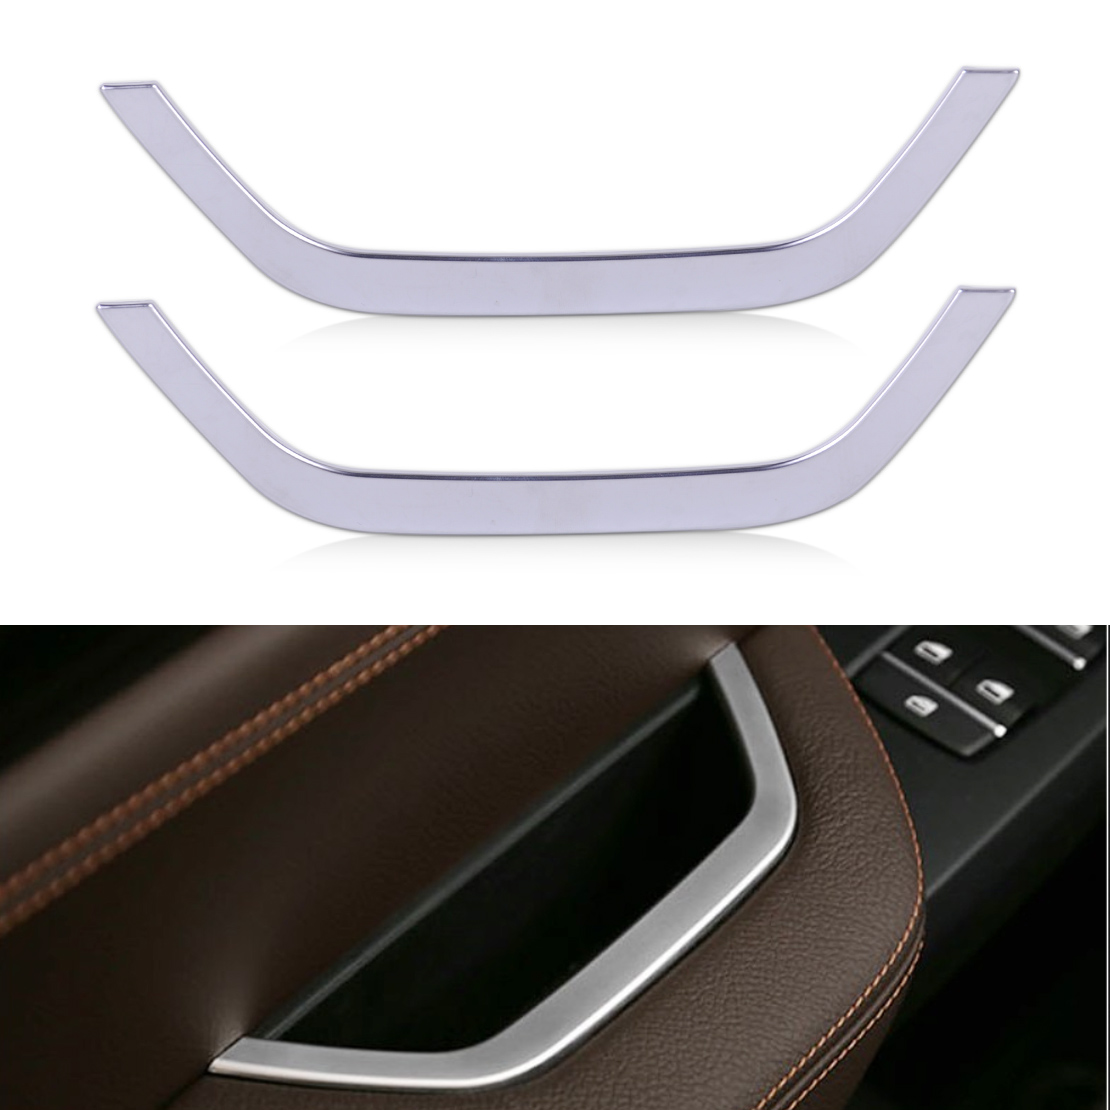 DWCX 2Pcs New Car Inner Armrest Door Storage Box Frame Cover Trim Decoration for BMW X3 F25 2011 2012 2013 2014 2015 2016 2017 abs chrome exterior side door body molding streamer cover trim for bmw x3 f25 2011 2012 2013 2014 2015 car styling accessories